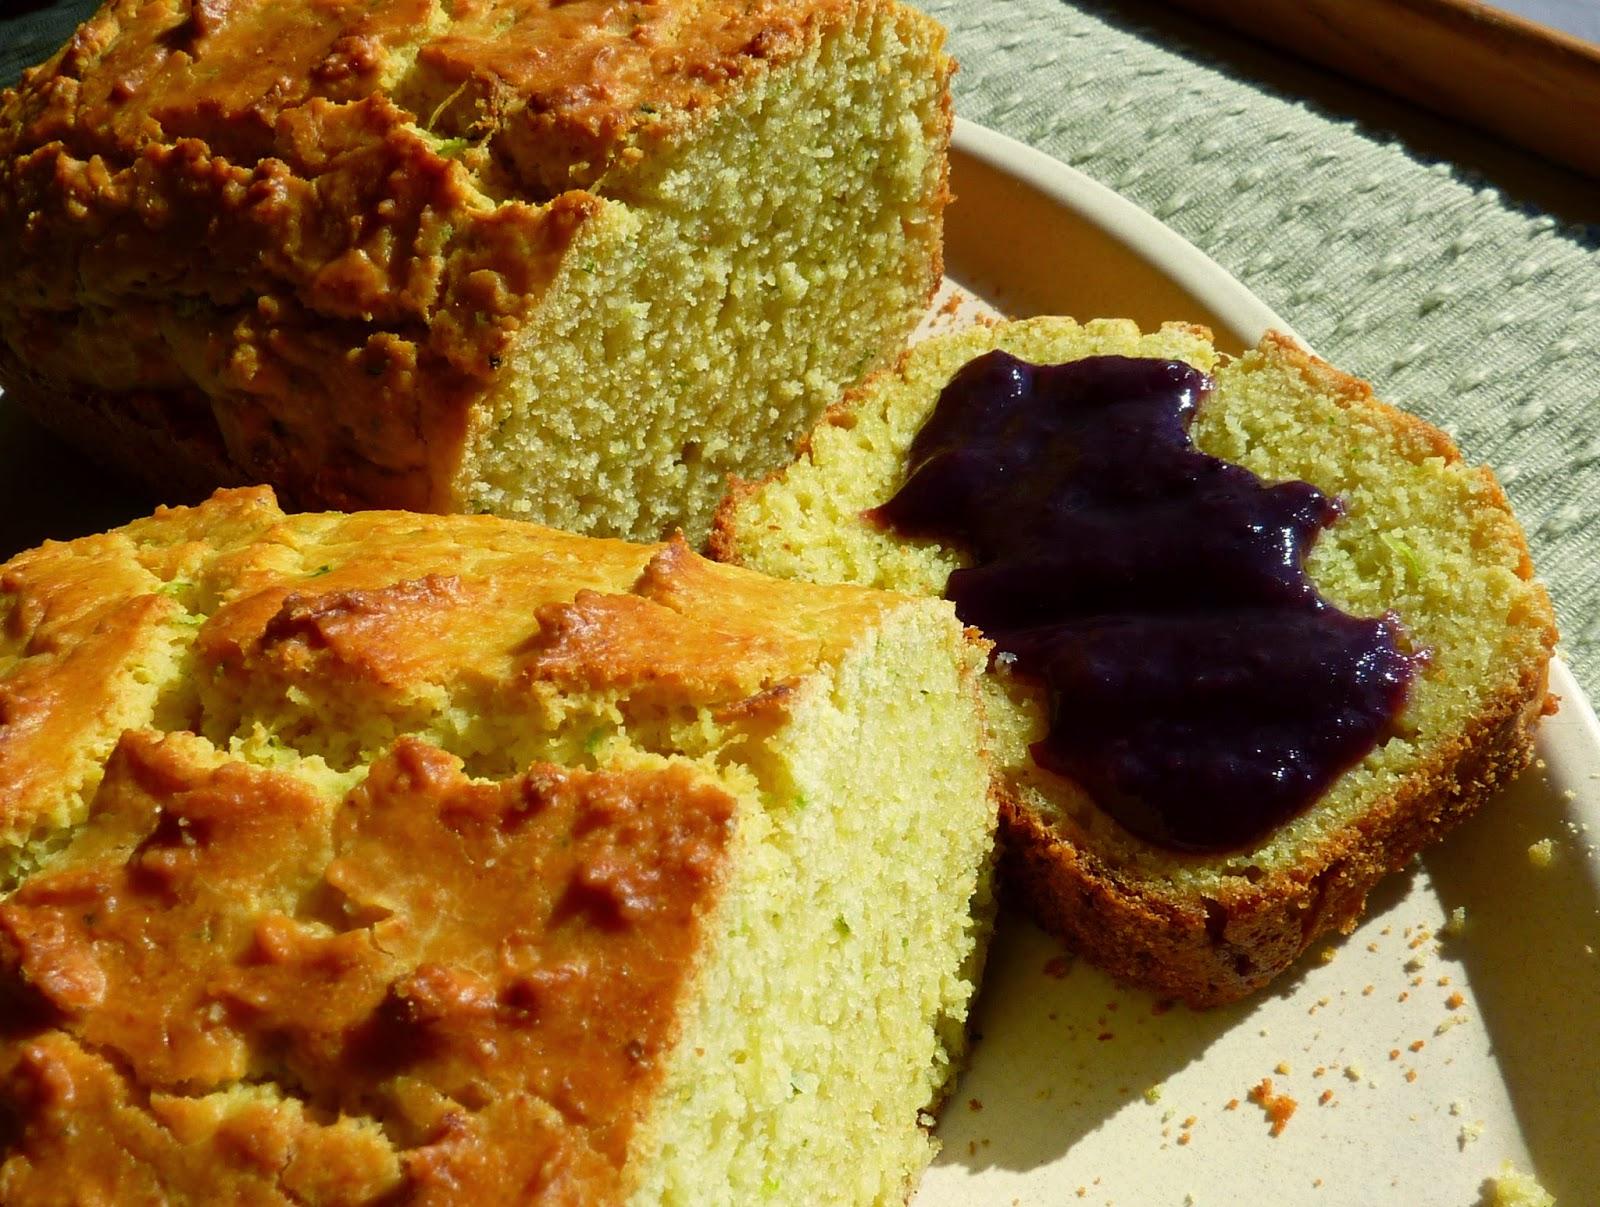 homemade gluten free bread